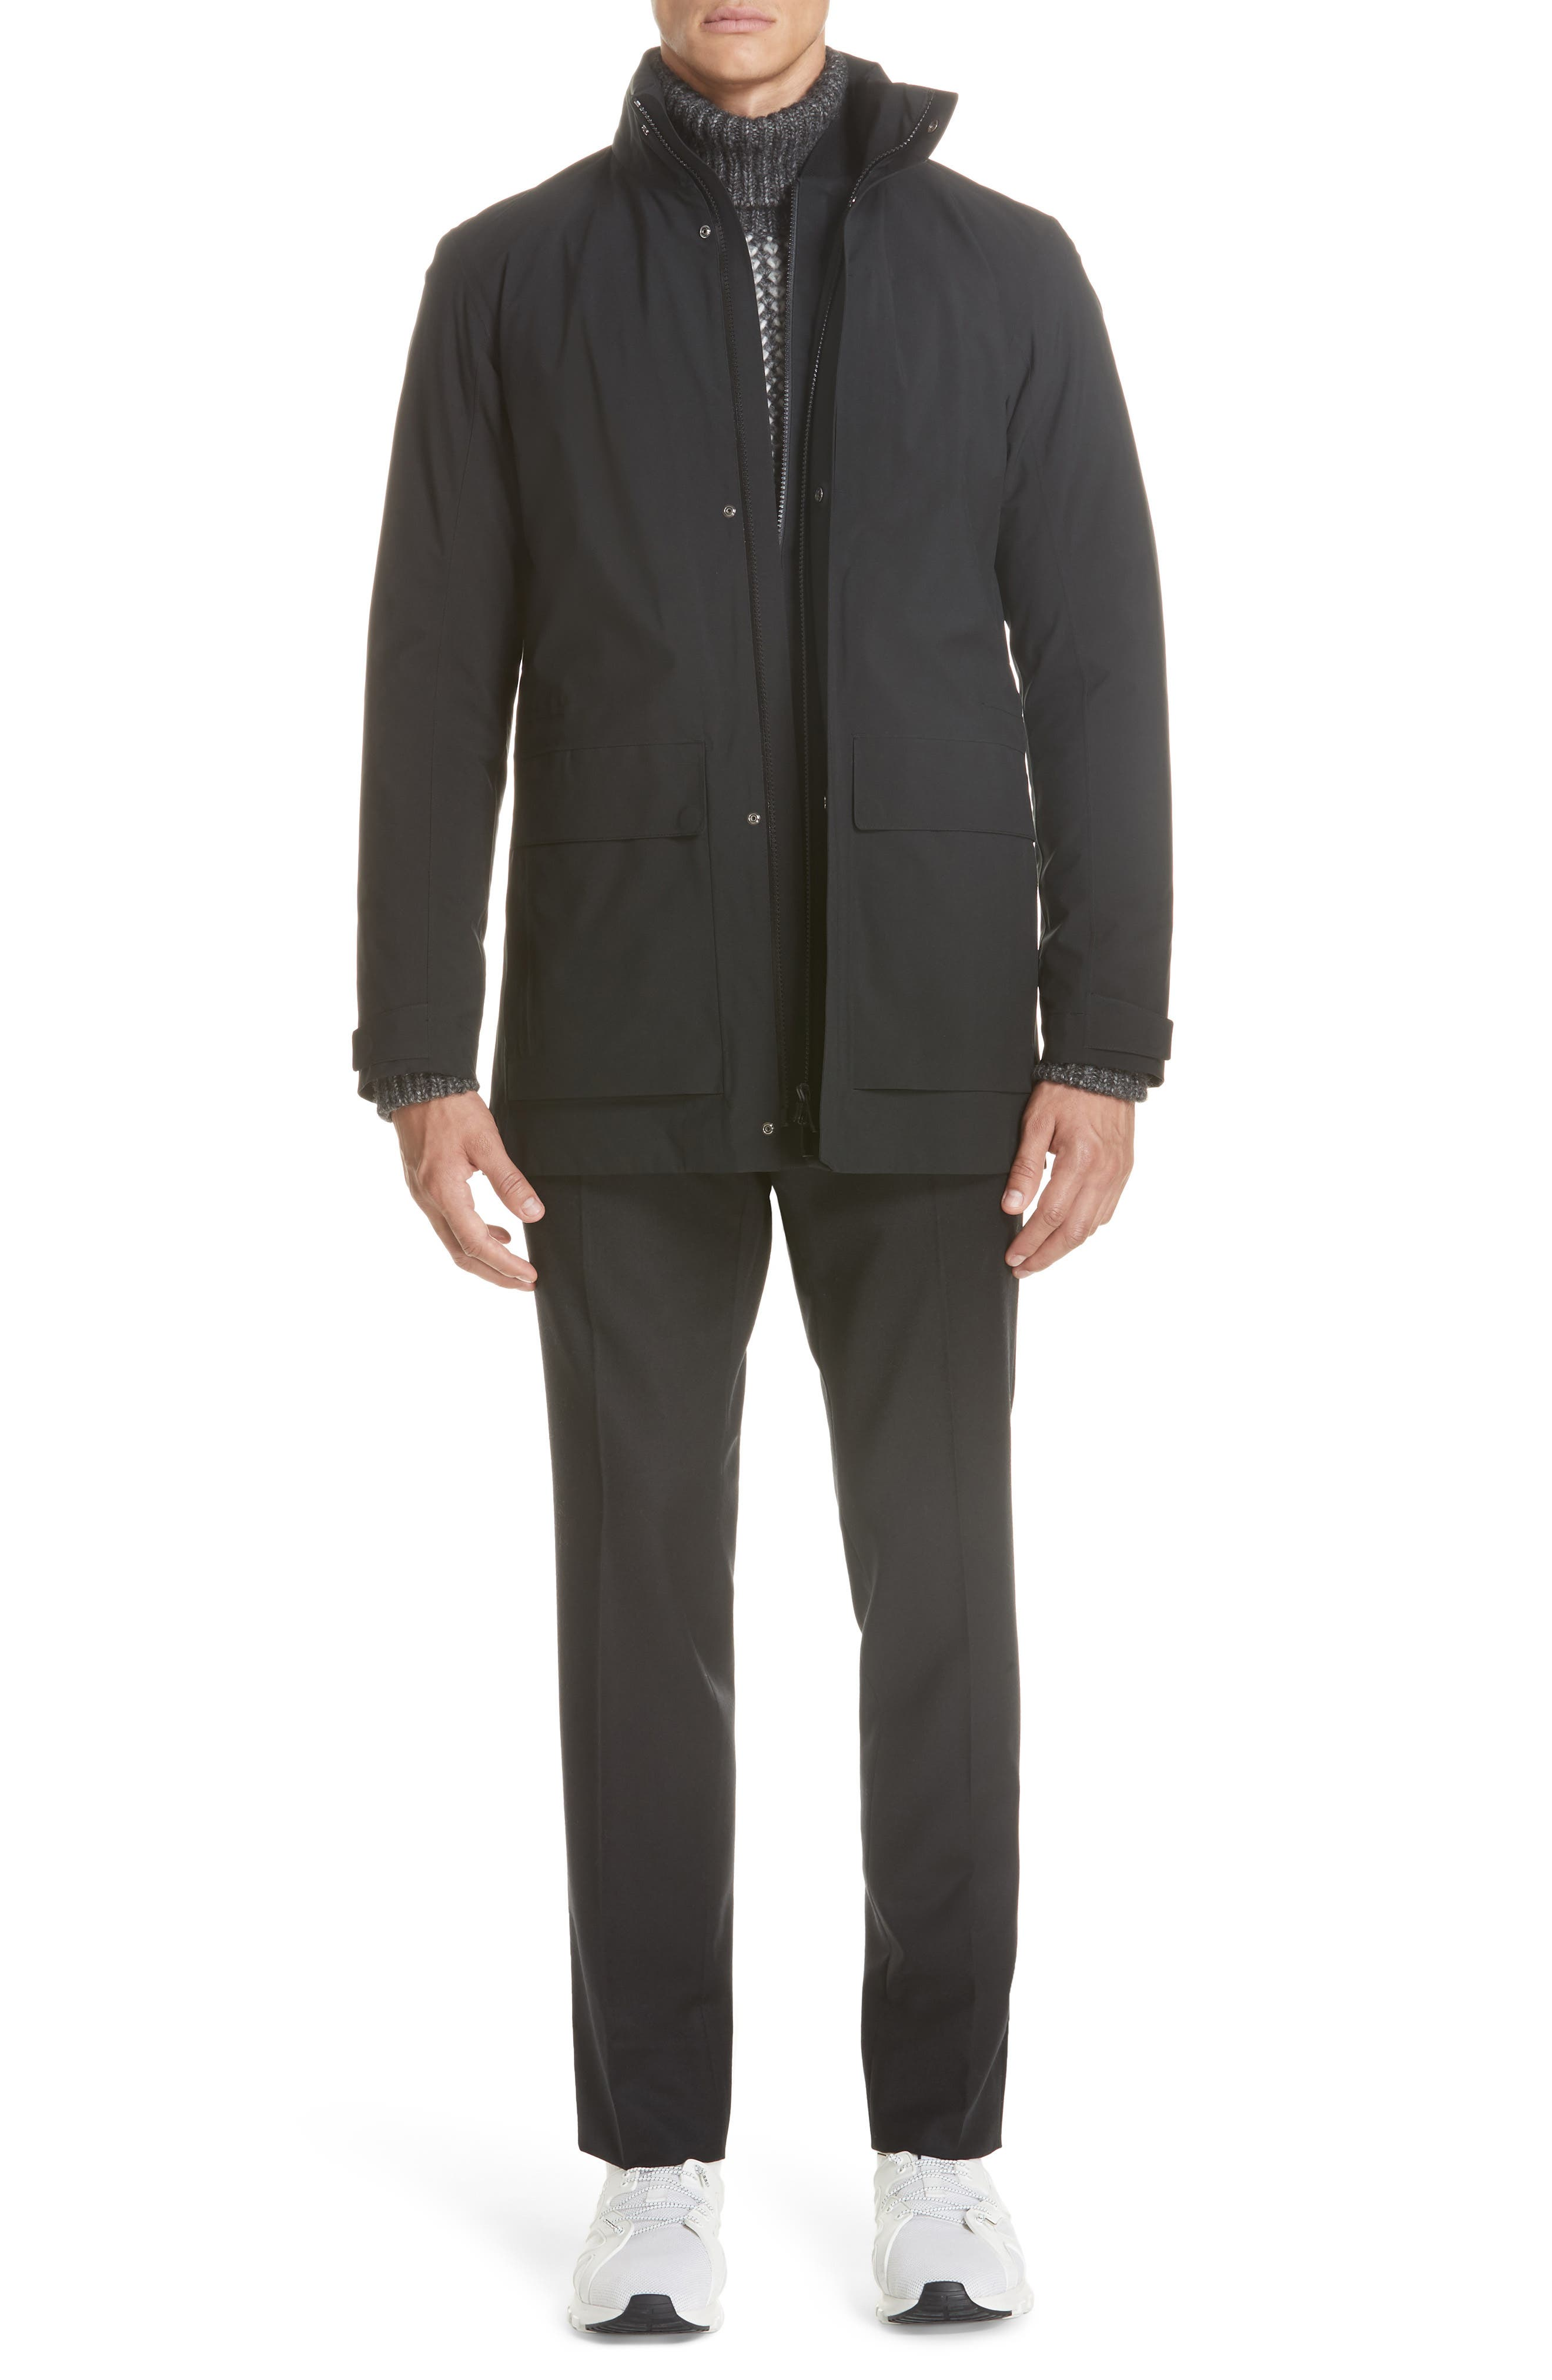 Z Zenga Trim Fit 3-in-1 Jacket,                             Alternate thumbnail 8, color,                             BLACK